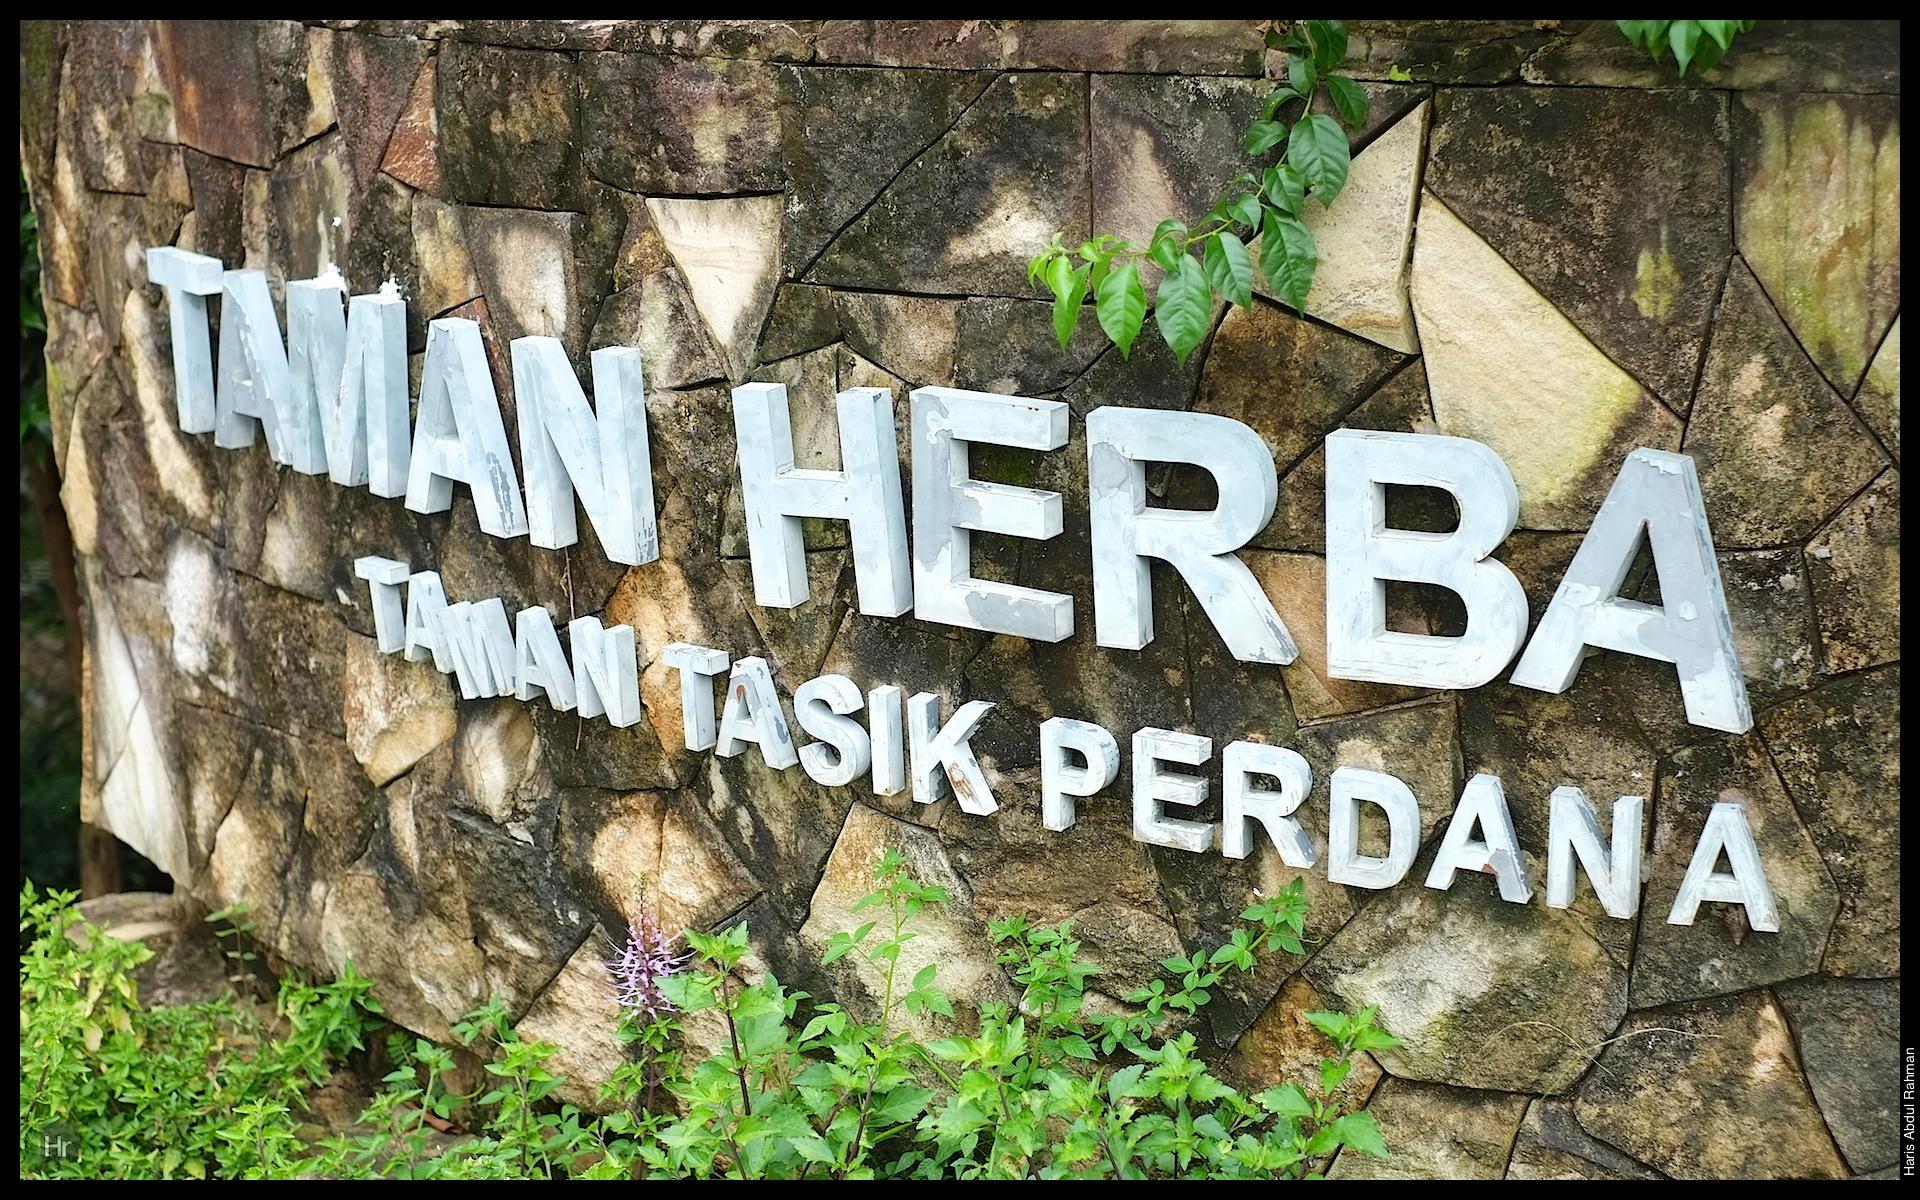 Welcome to Taman Herba